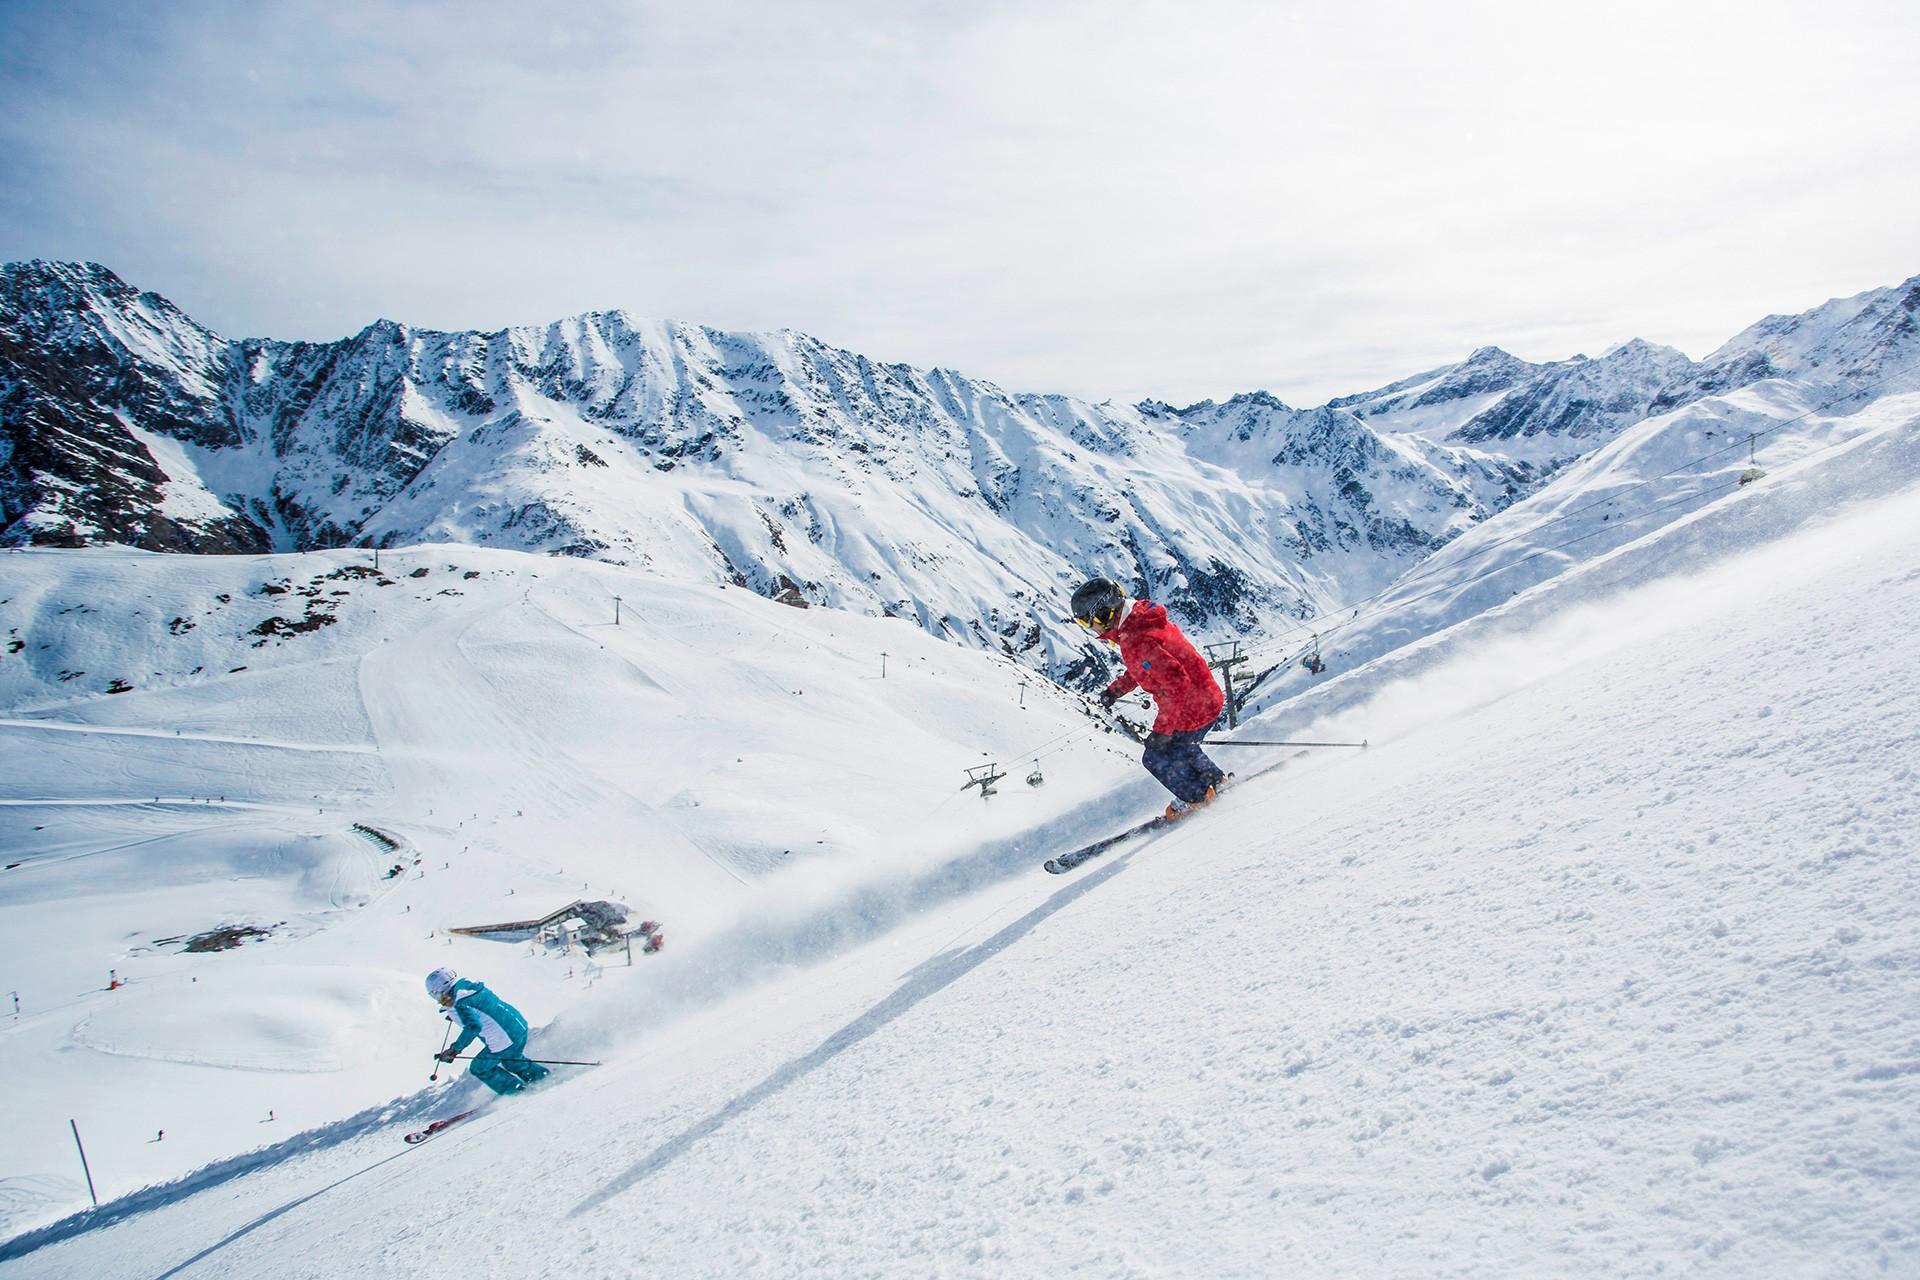 pitztal ski map: ski resorts & ski pistes│pitztal region